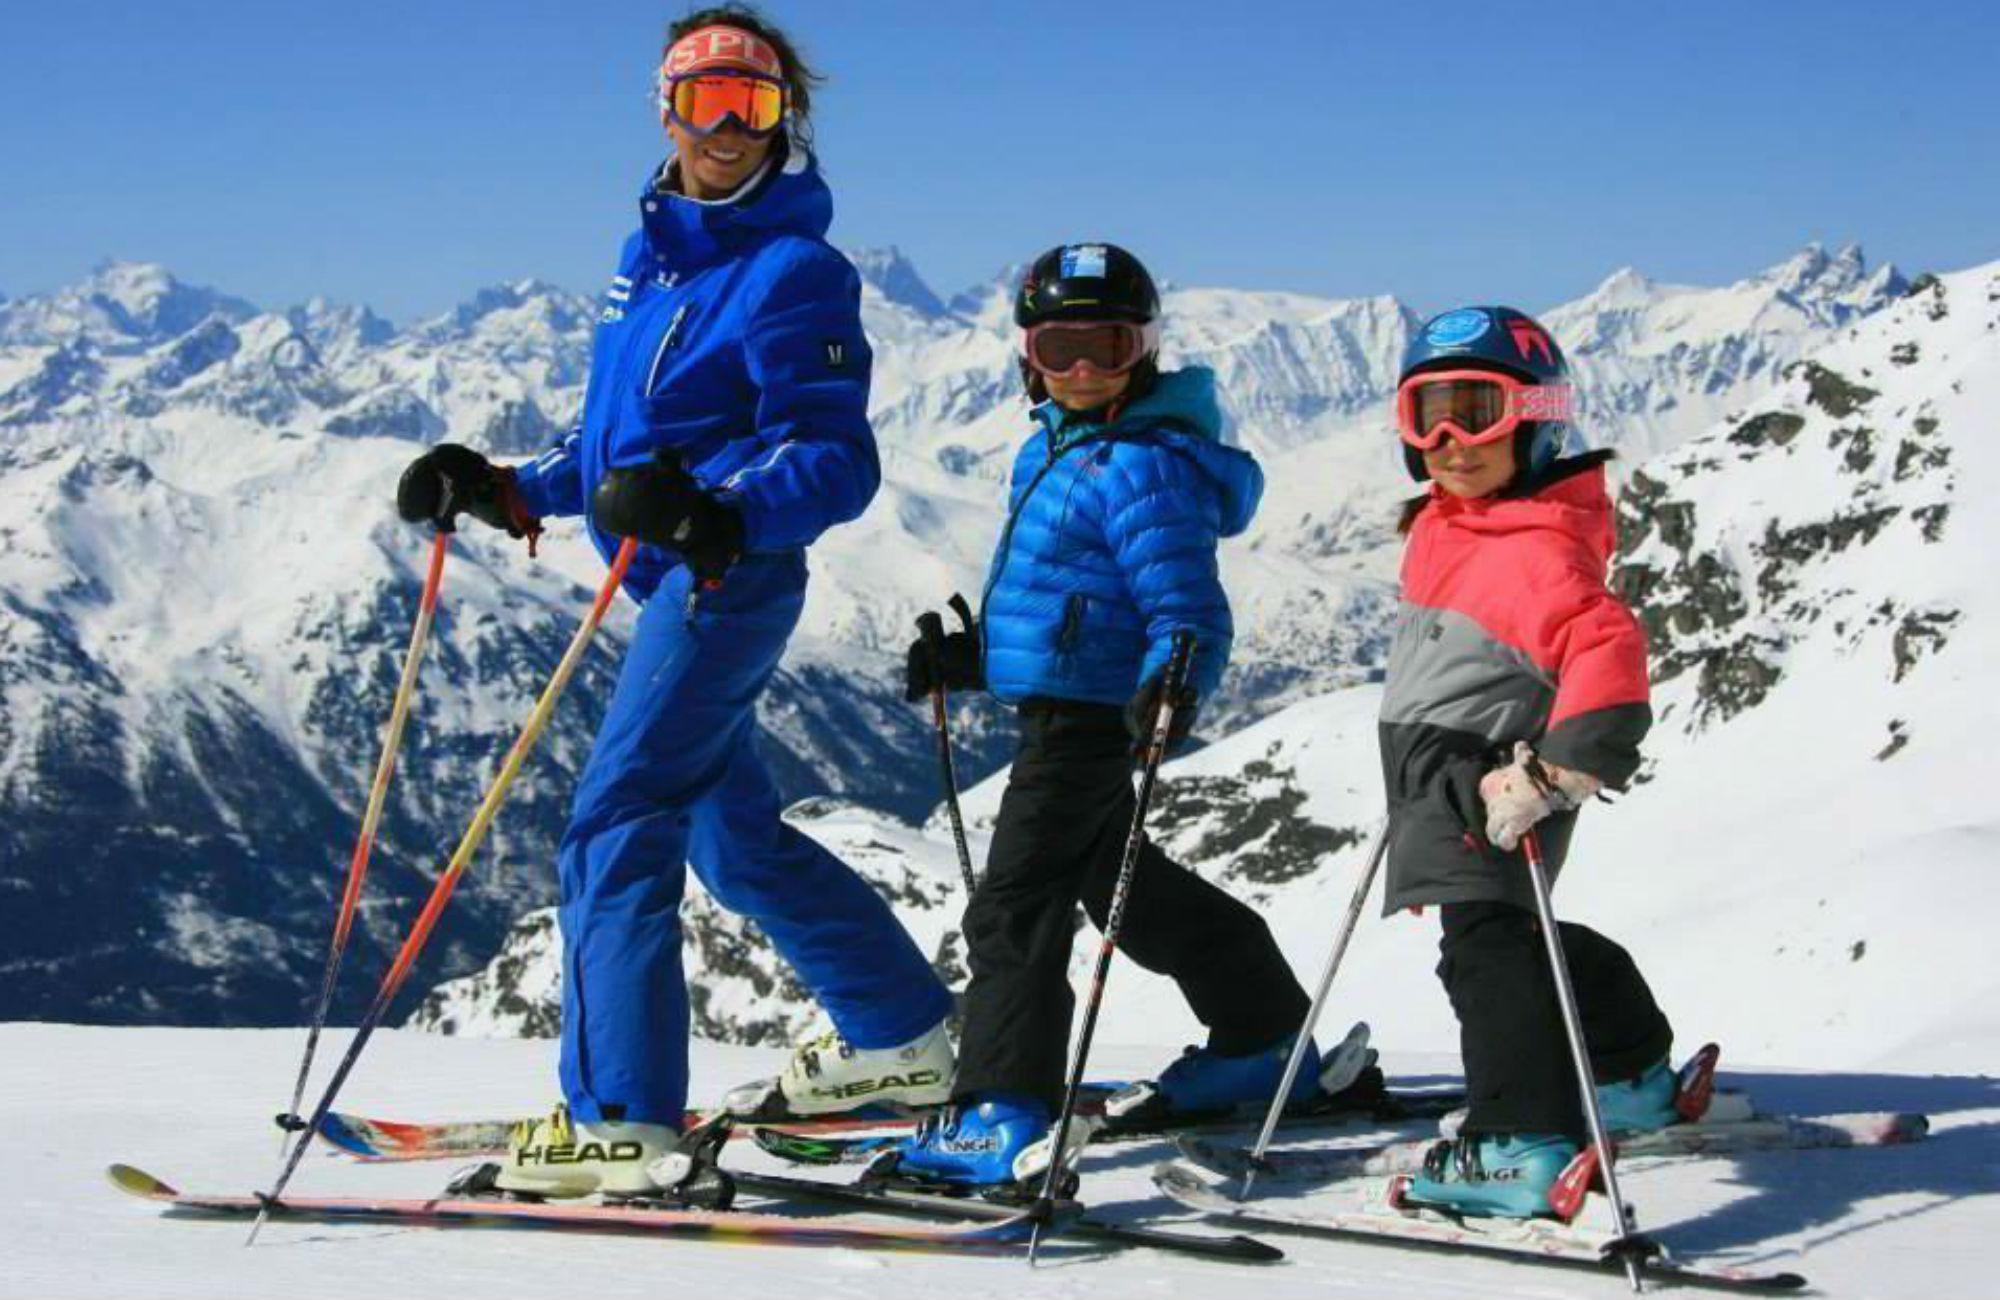 Skilehrerin posiert gemeinsam mit 2 Kindern vor dem Bergpanorama des Skigebiets Les 3 Vallées.